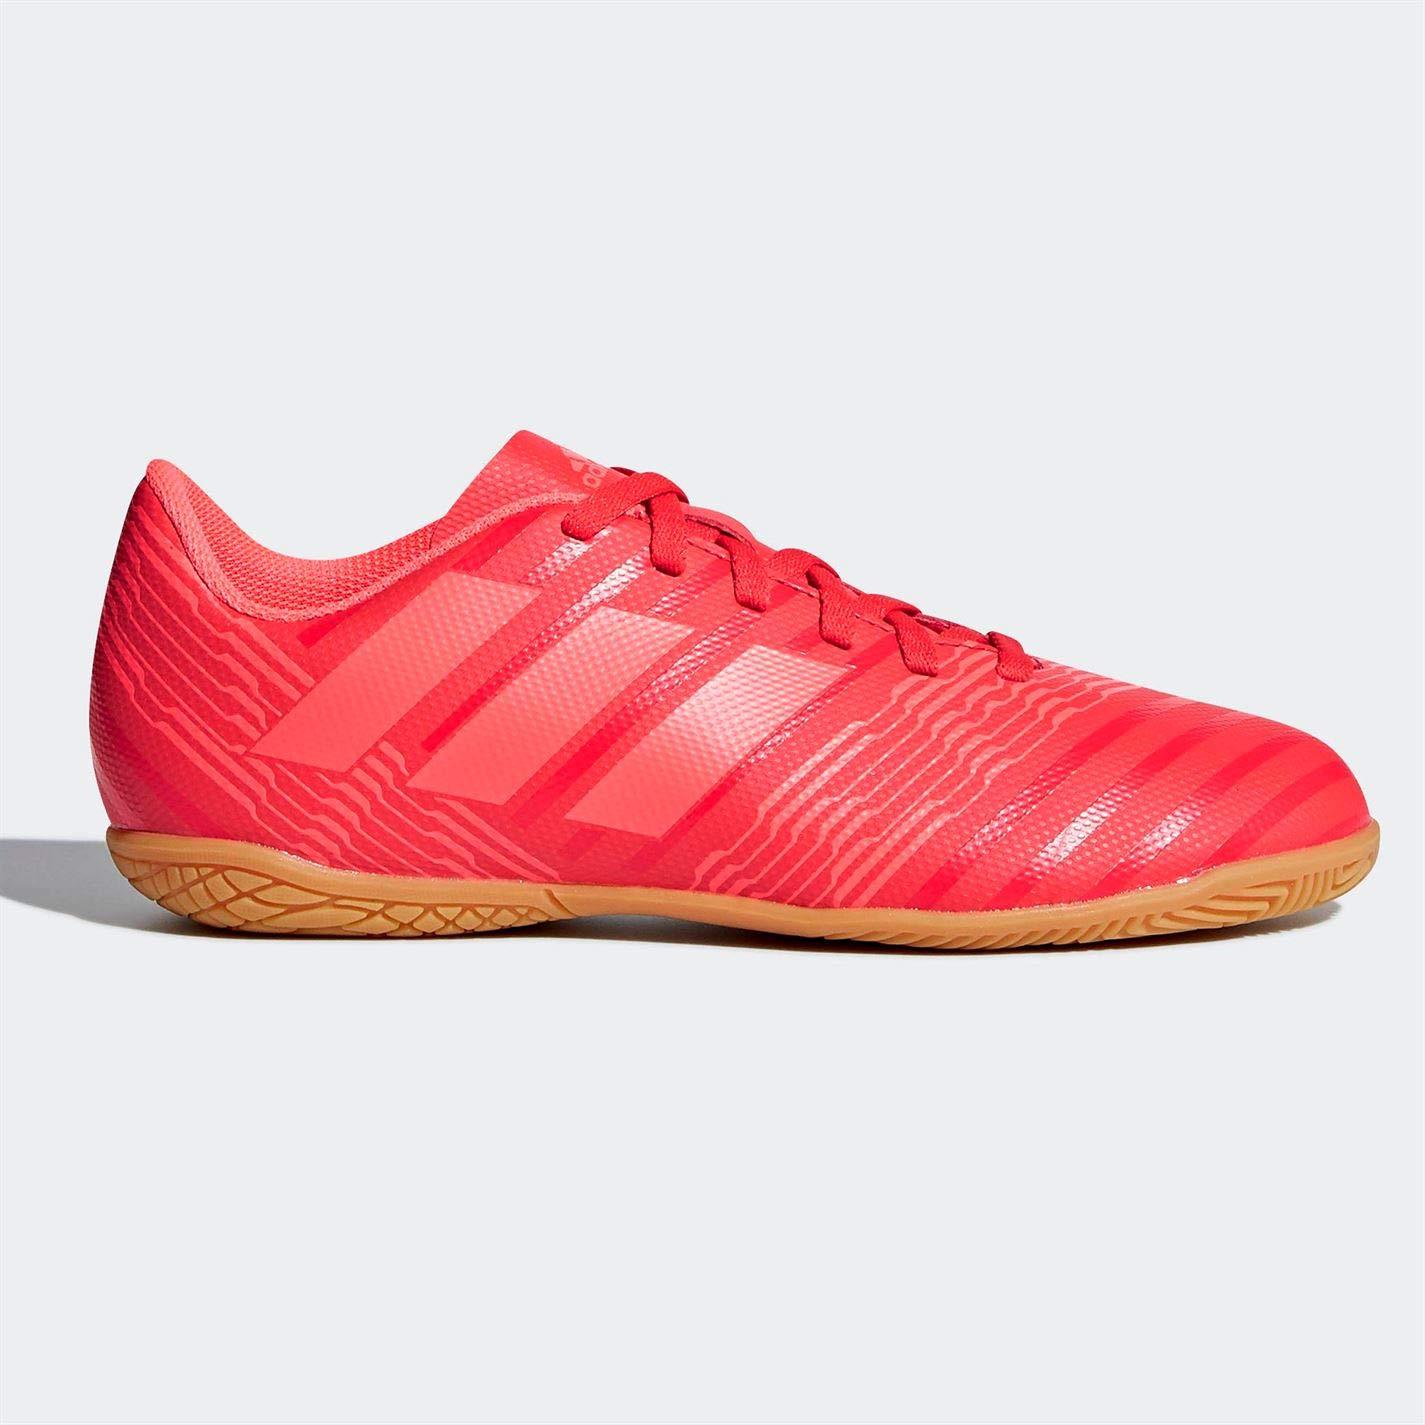 Adidas Adidas Adidas Unisex-Kinder Nemeziz Tango 17.4 in J Futsalschuhe Mehrfarbig (Indigo 001) 45d82e